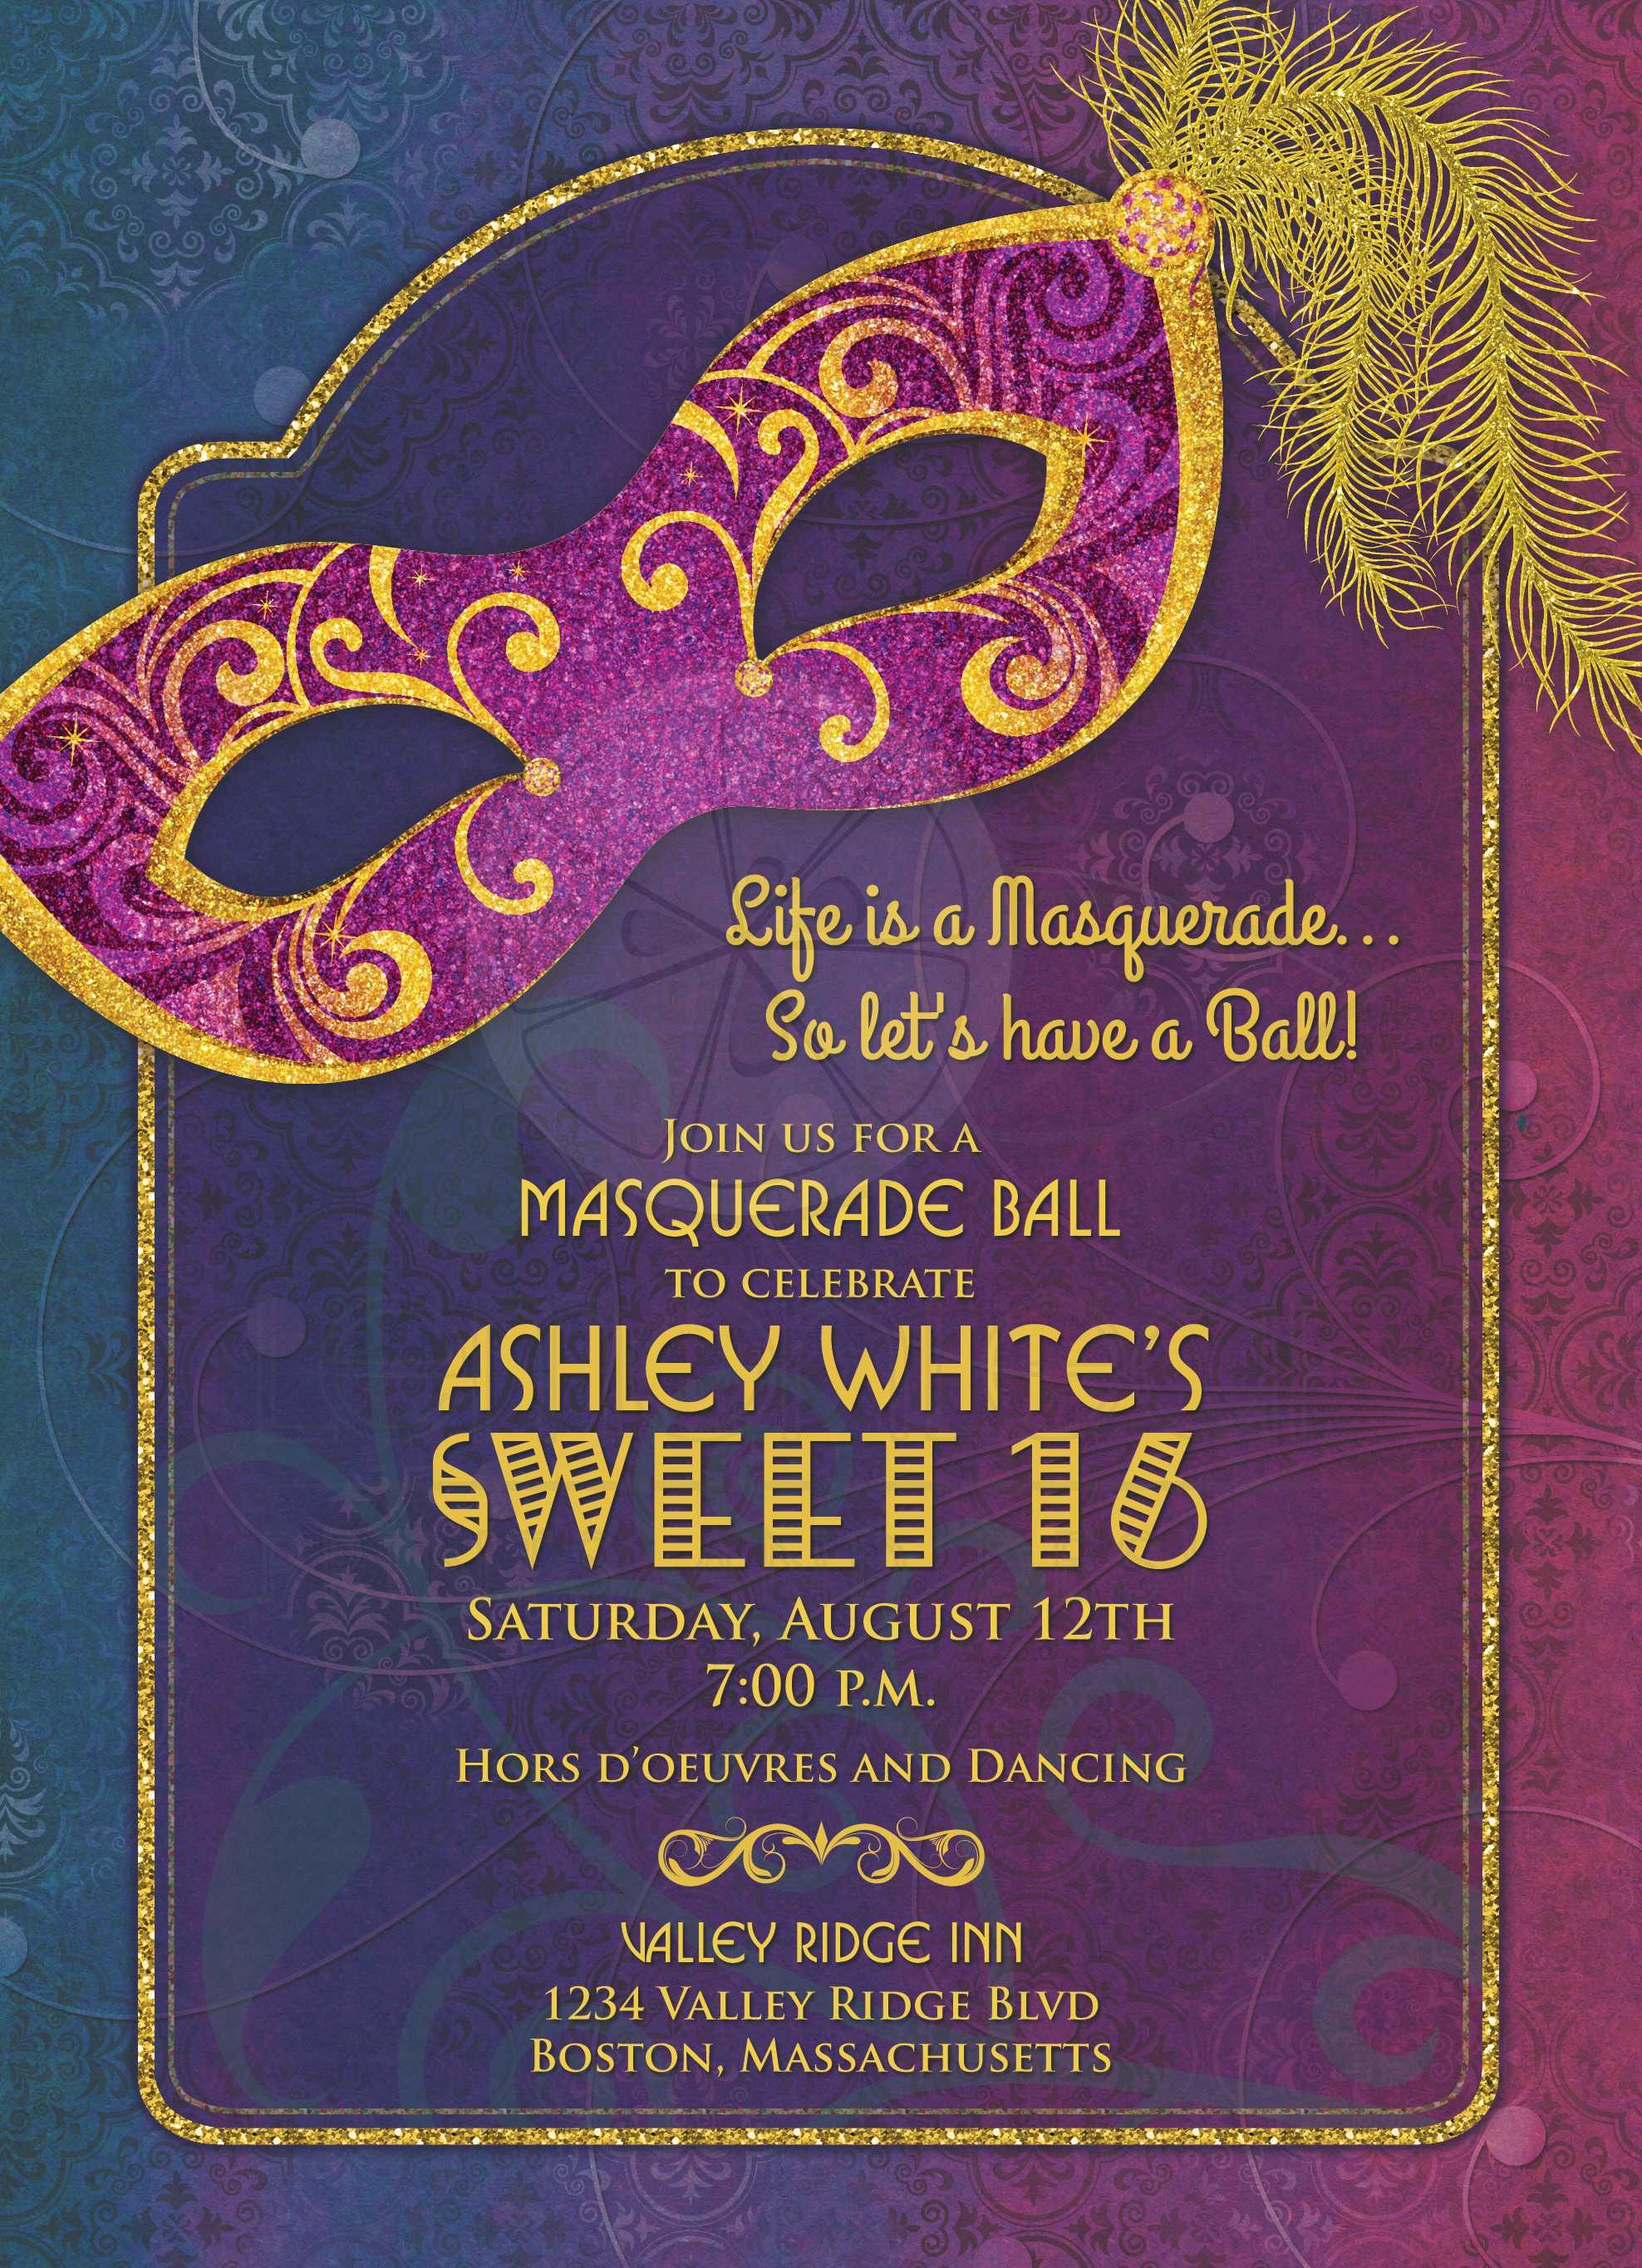 Masquerade Ball Sweet 16 Invitation – Sweet 16 Birthday Invitations